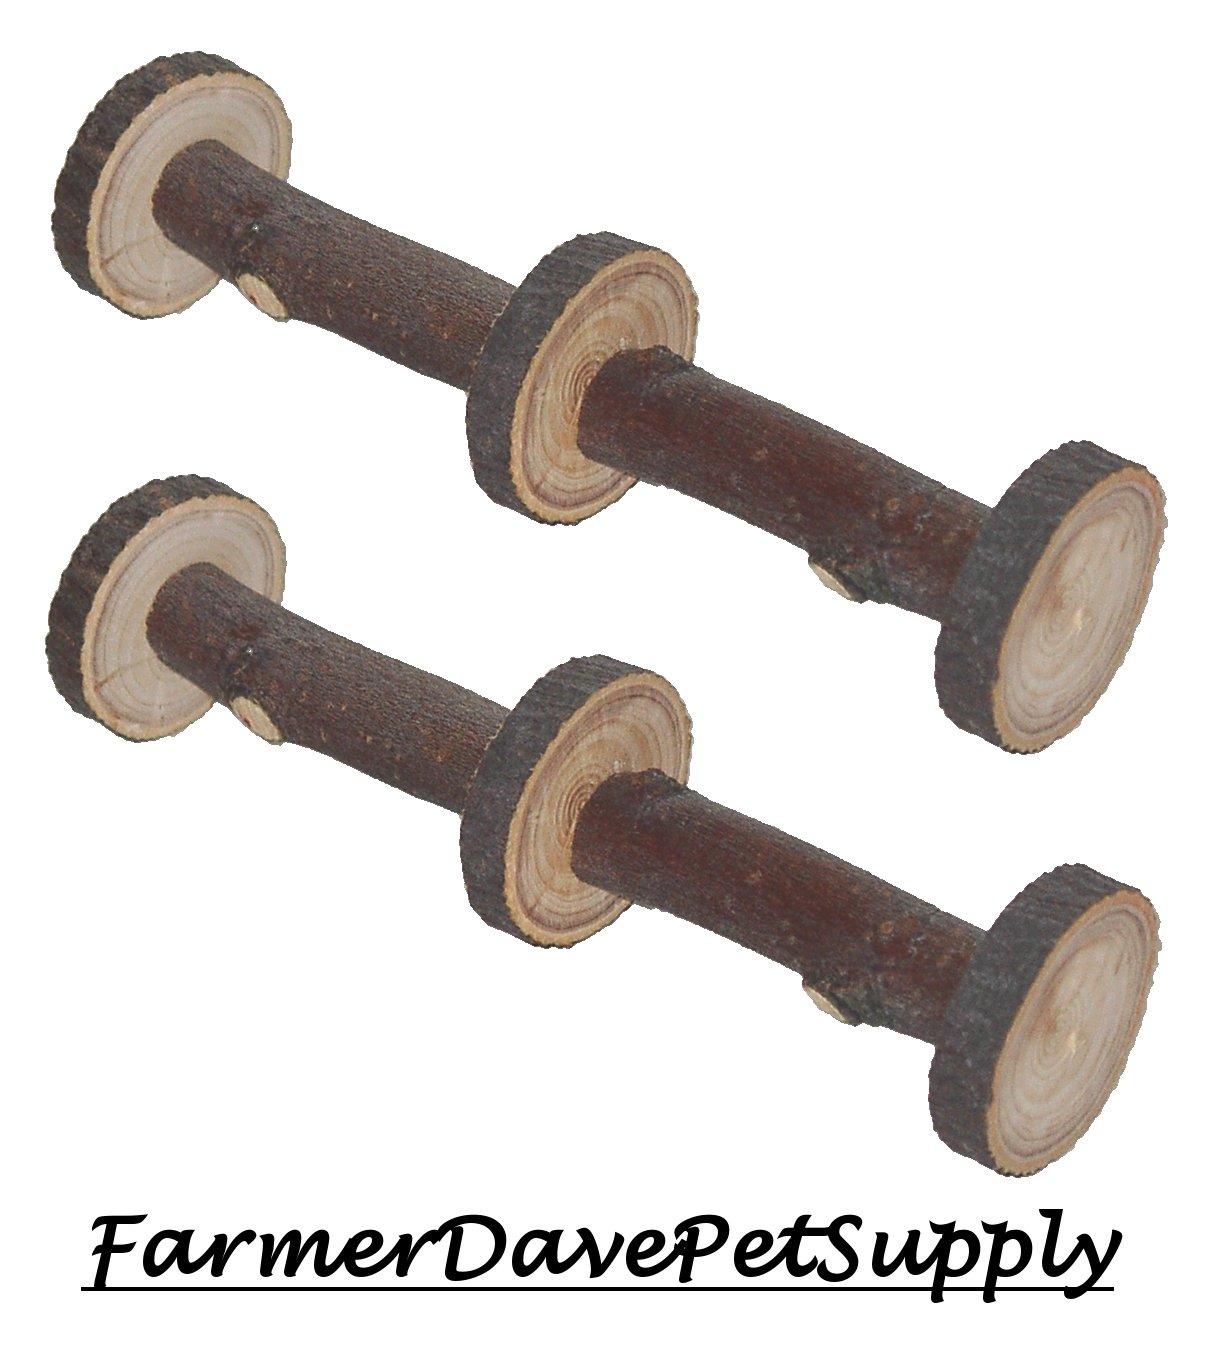 FarmerDavePetSupply Three Wheeler Apple Chew Toy for Small Animals - Dual Pack